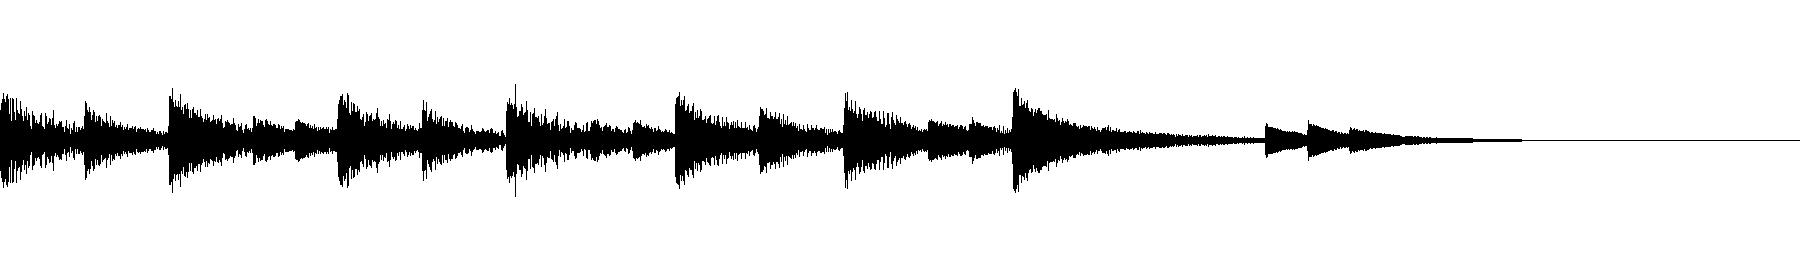 crystal chords